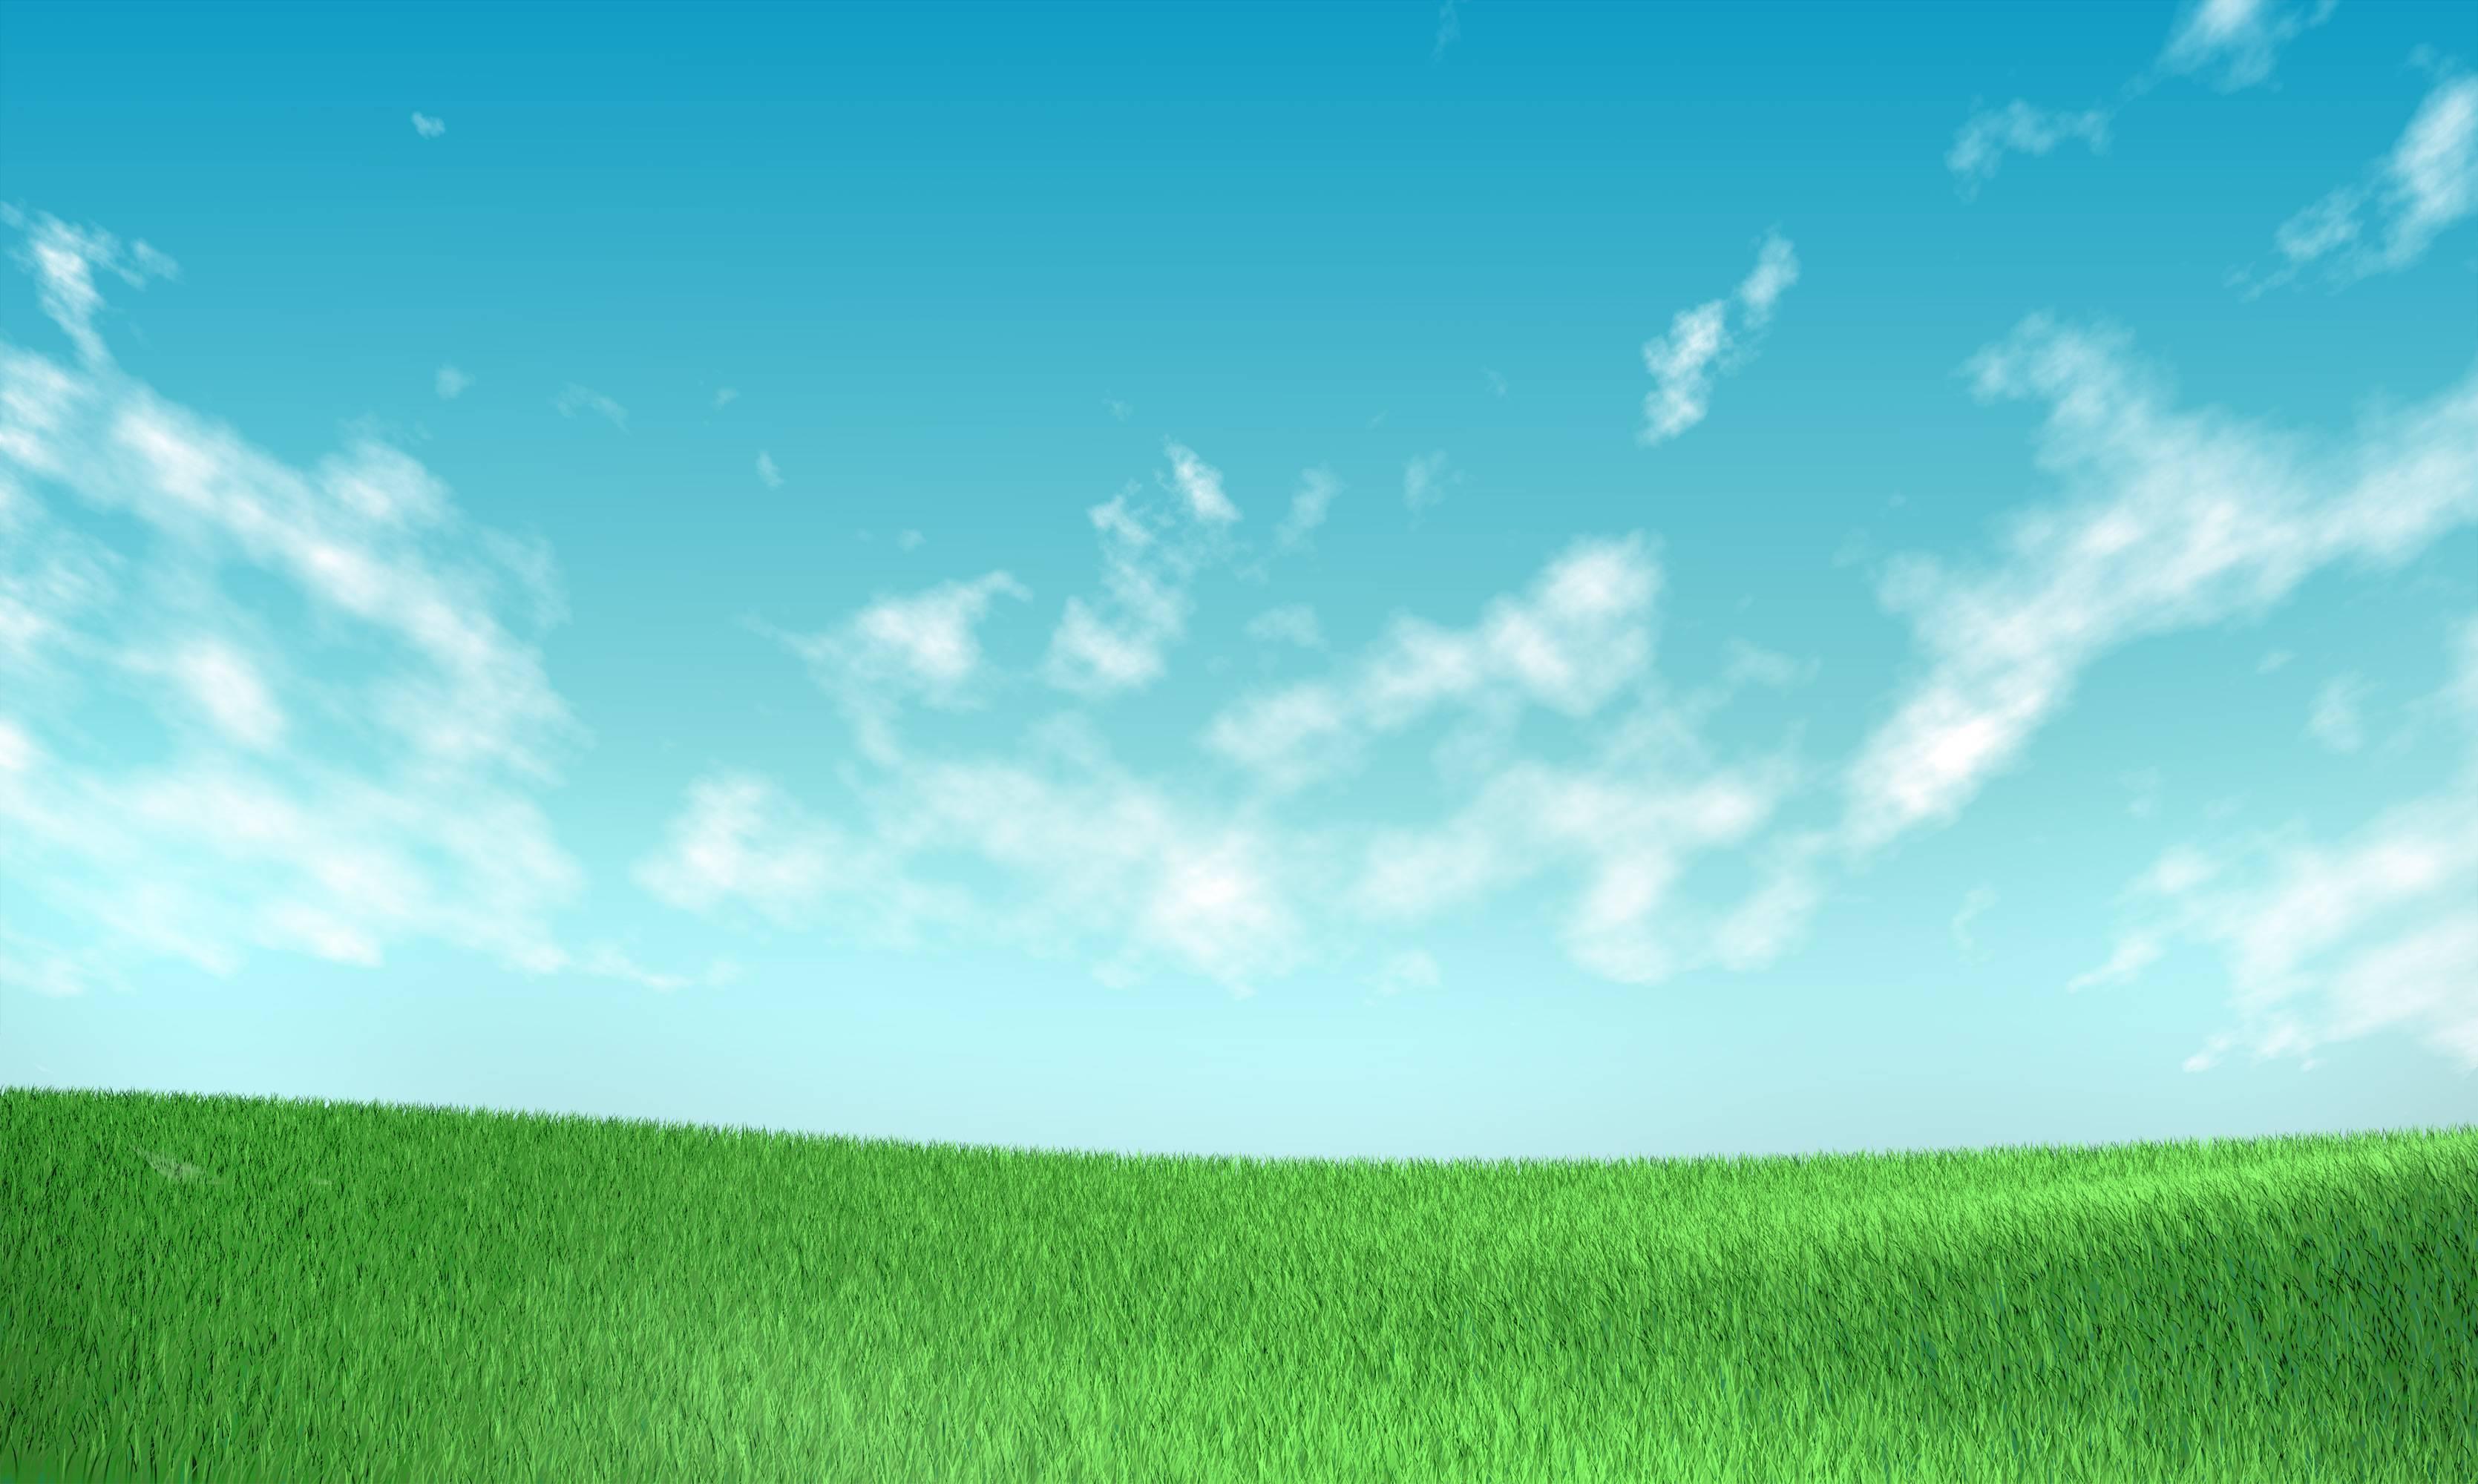 Sky clipart background - ClipartFest